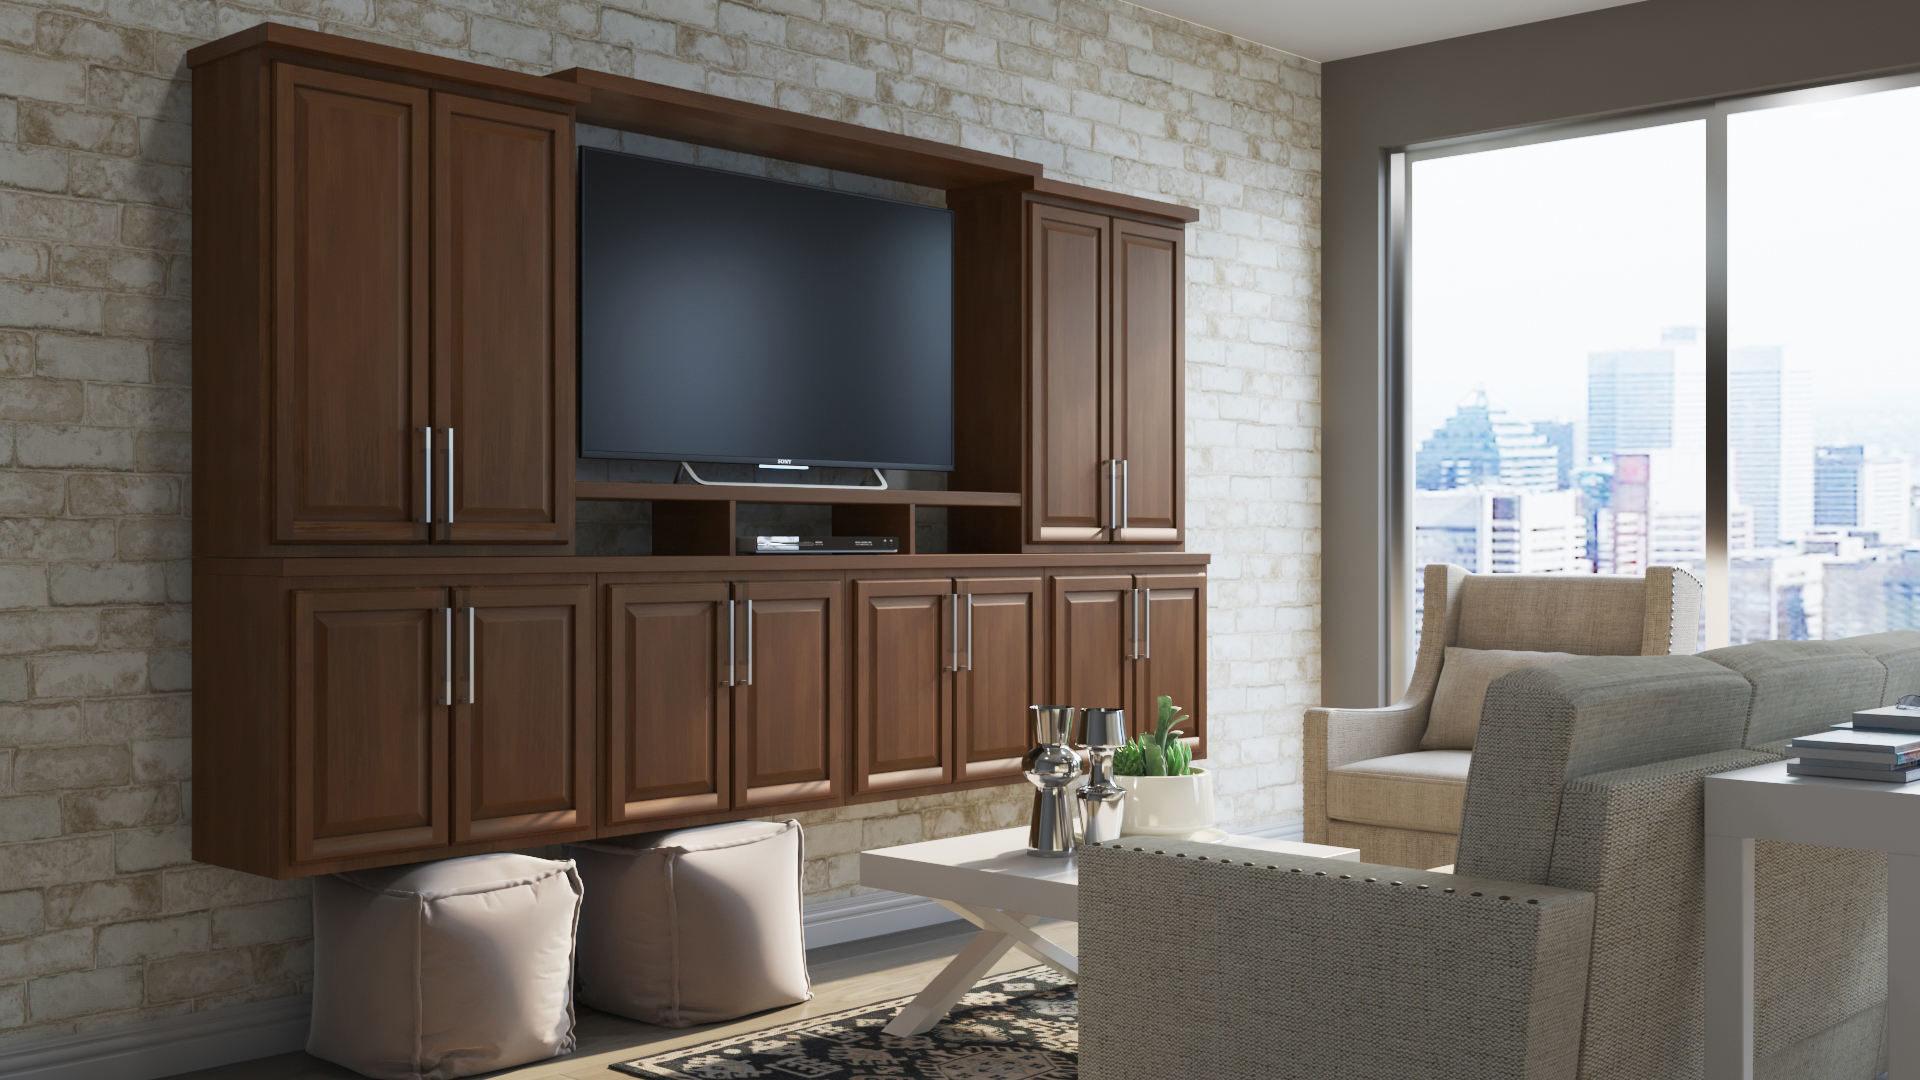 Hampton Wall Kitchen Cabinets In Cognac